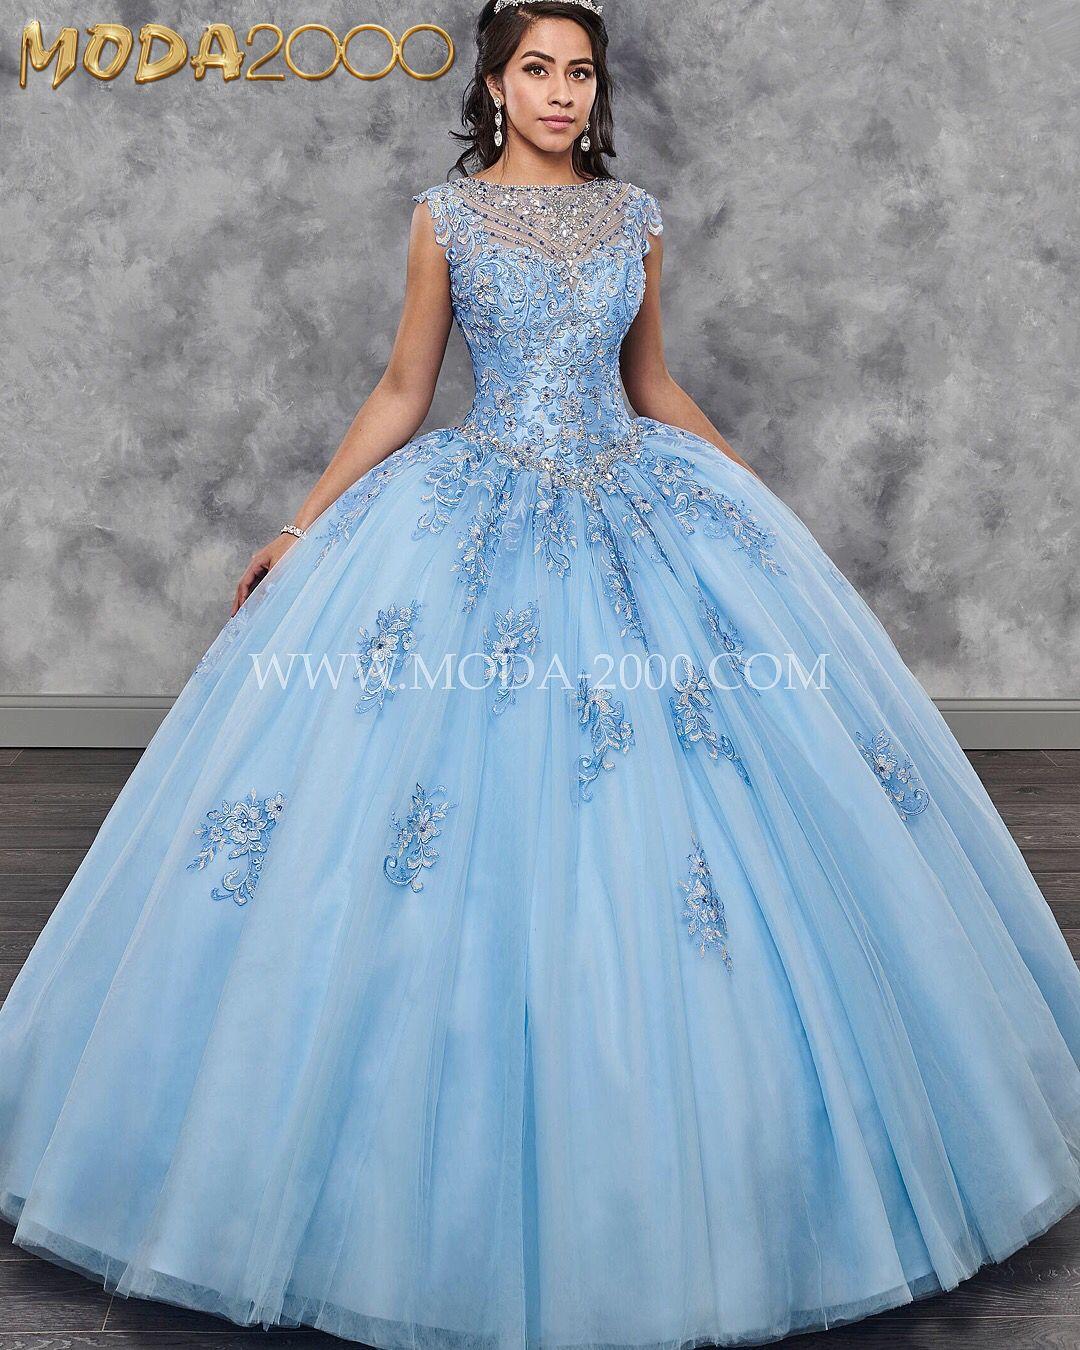 Bahama Blue Periwinkle Cinderella Quinceanera Dress Quinceanera Dresses Blue Quinceanera Dresses Quince Dresses [ 1350 x 1080 Pixel ]